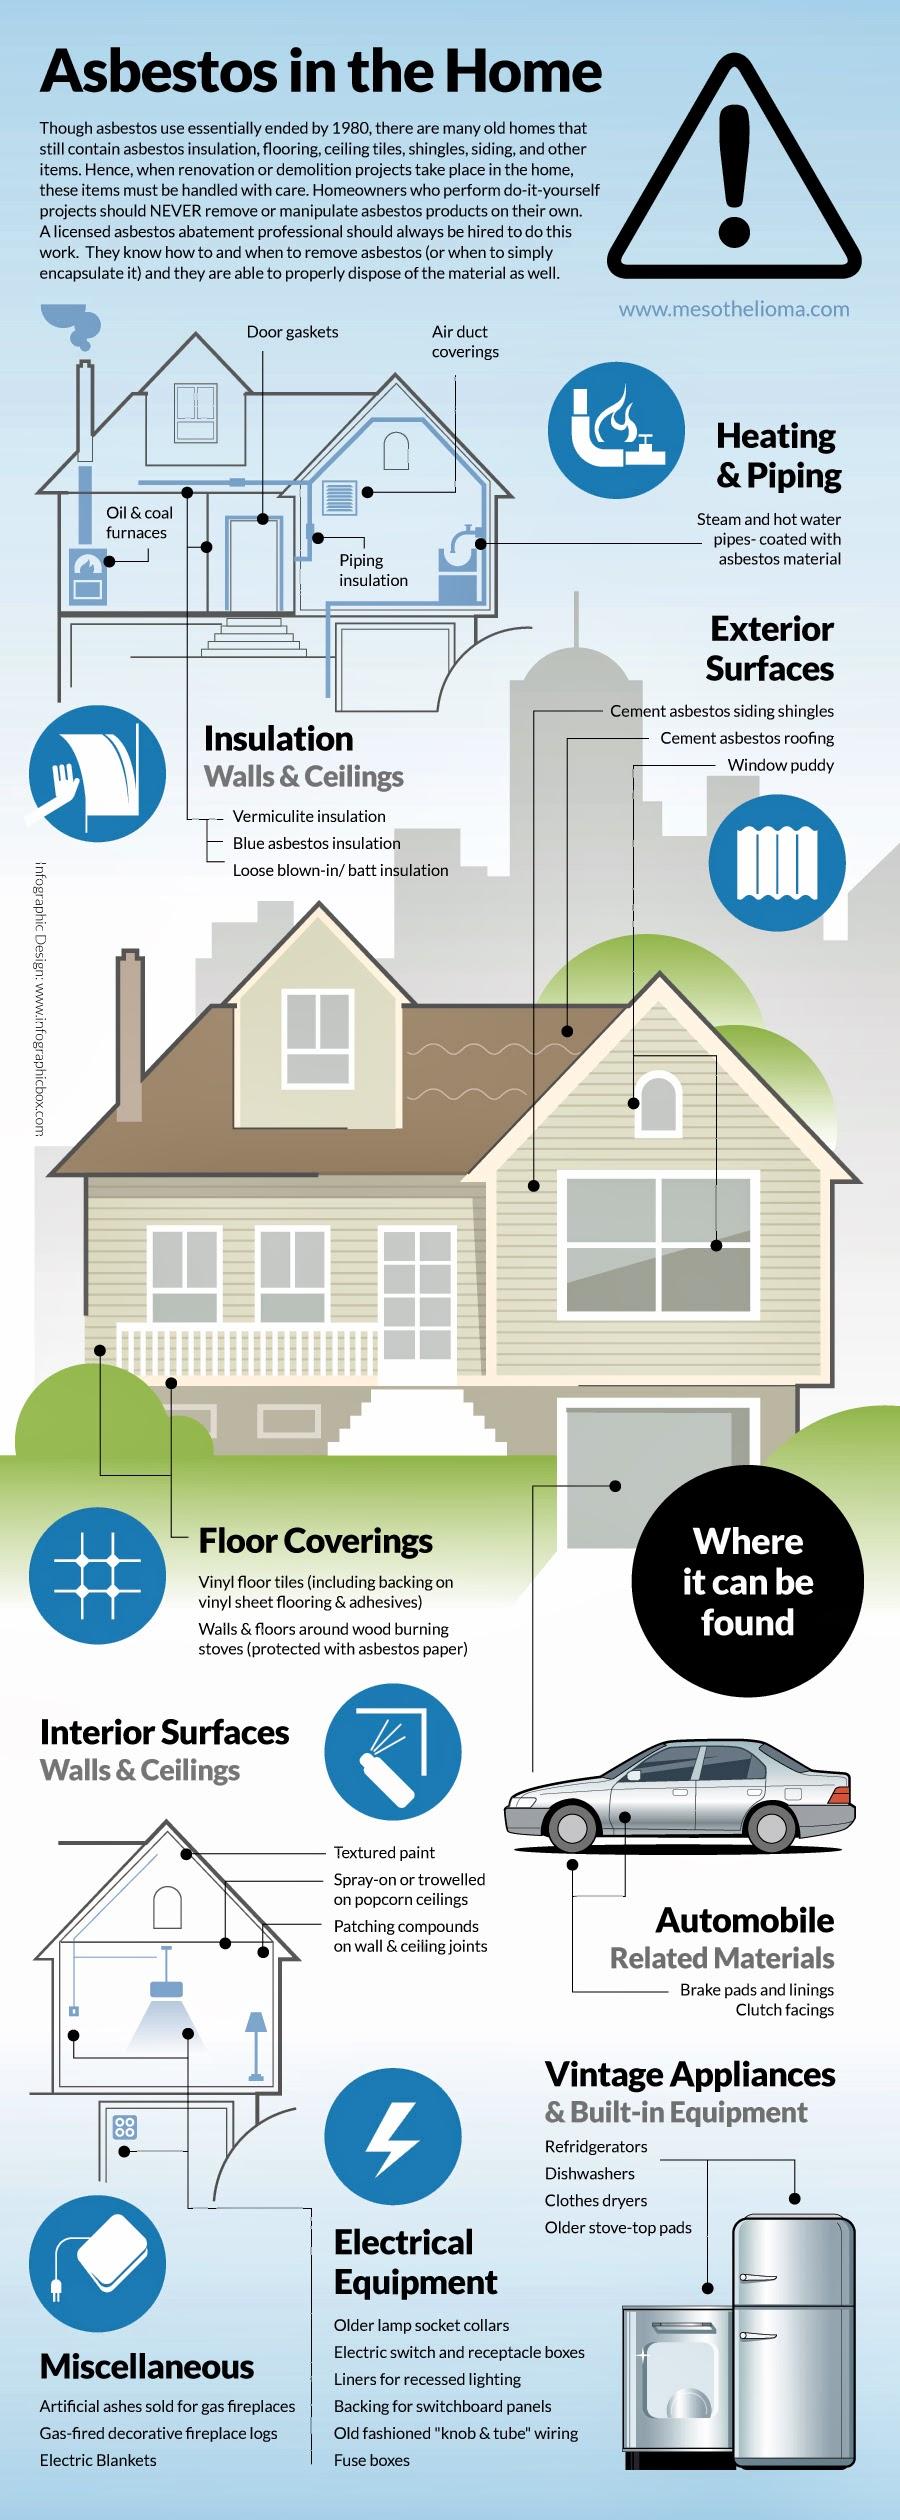 Asbestos in the Home, infographic by Boris Benko